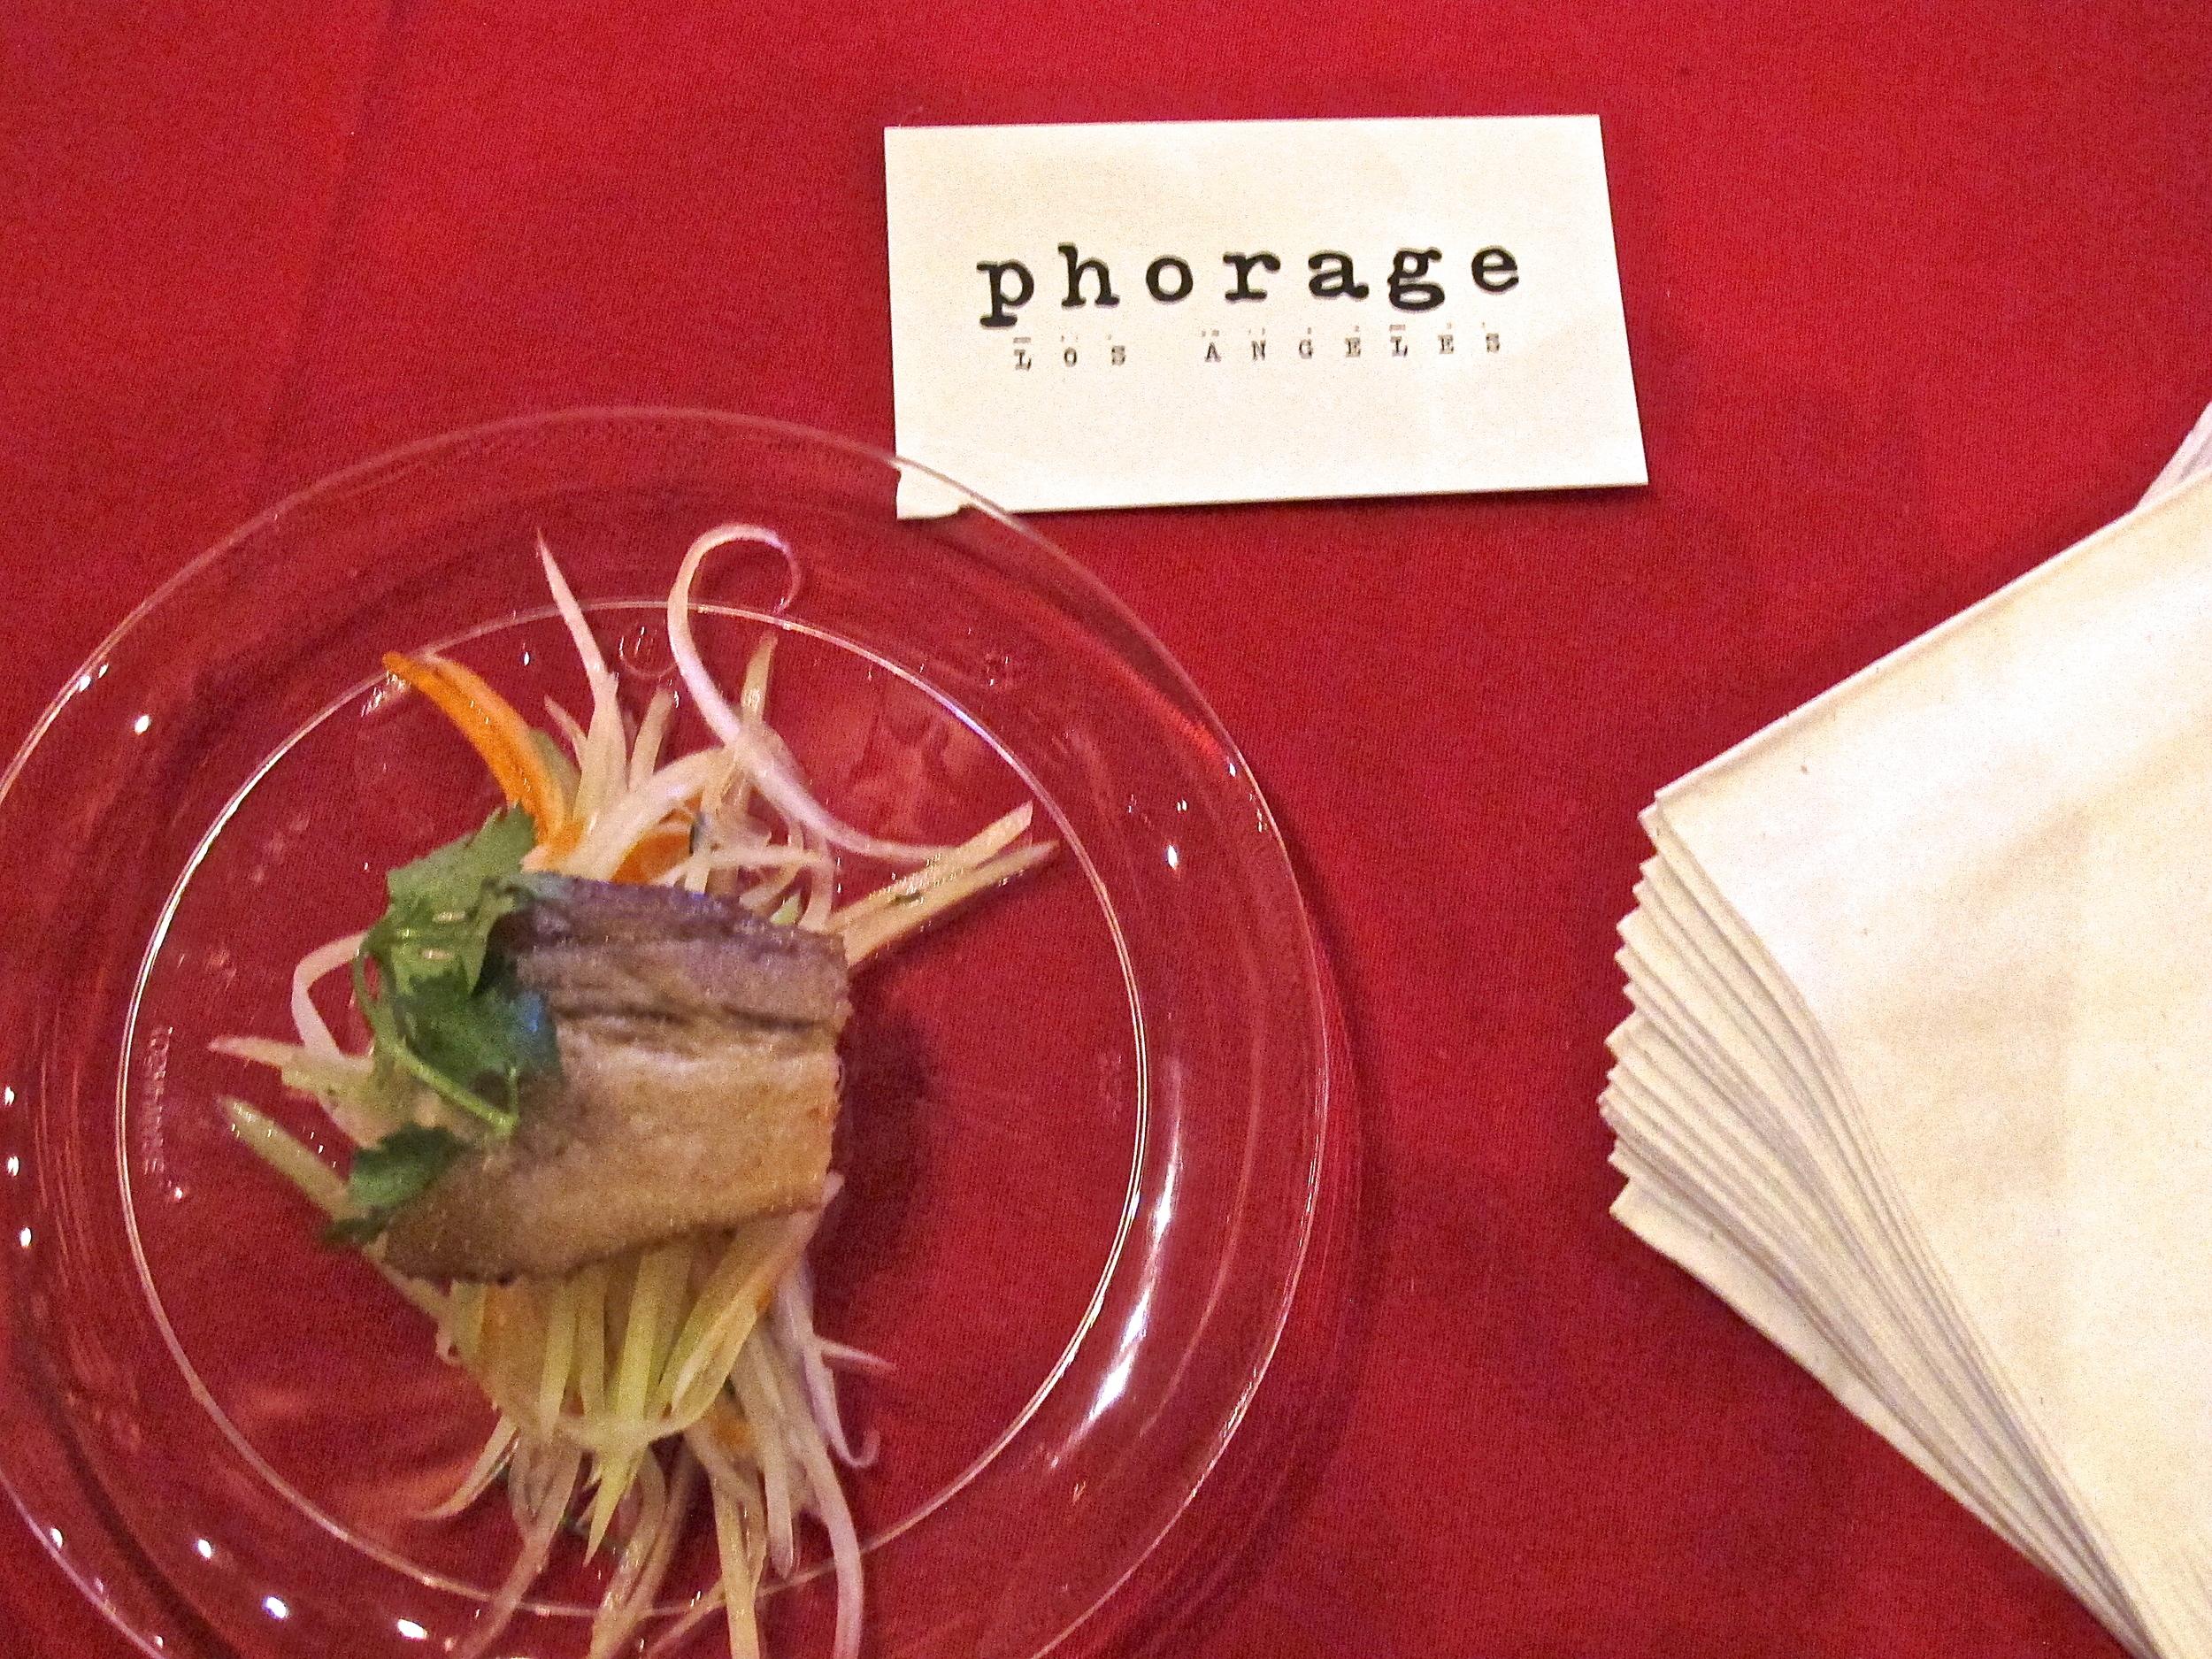 Lemongrass pork belly from Phorage